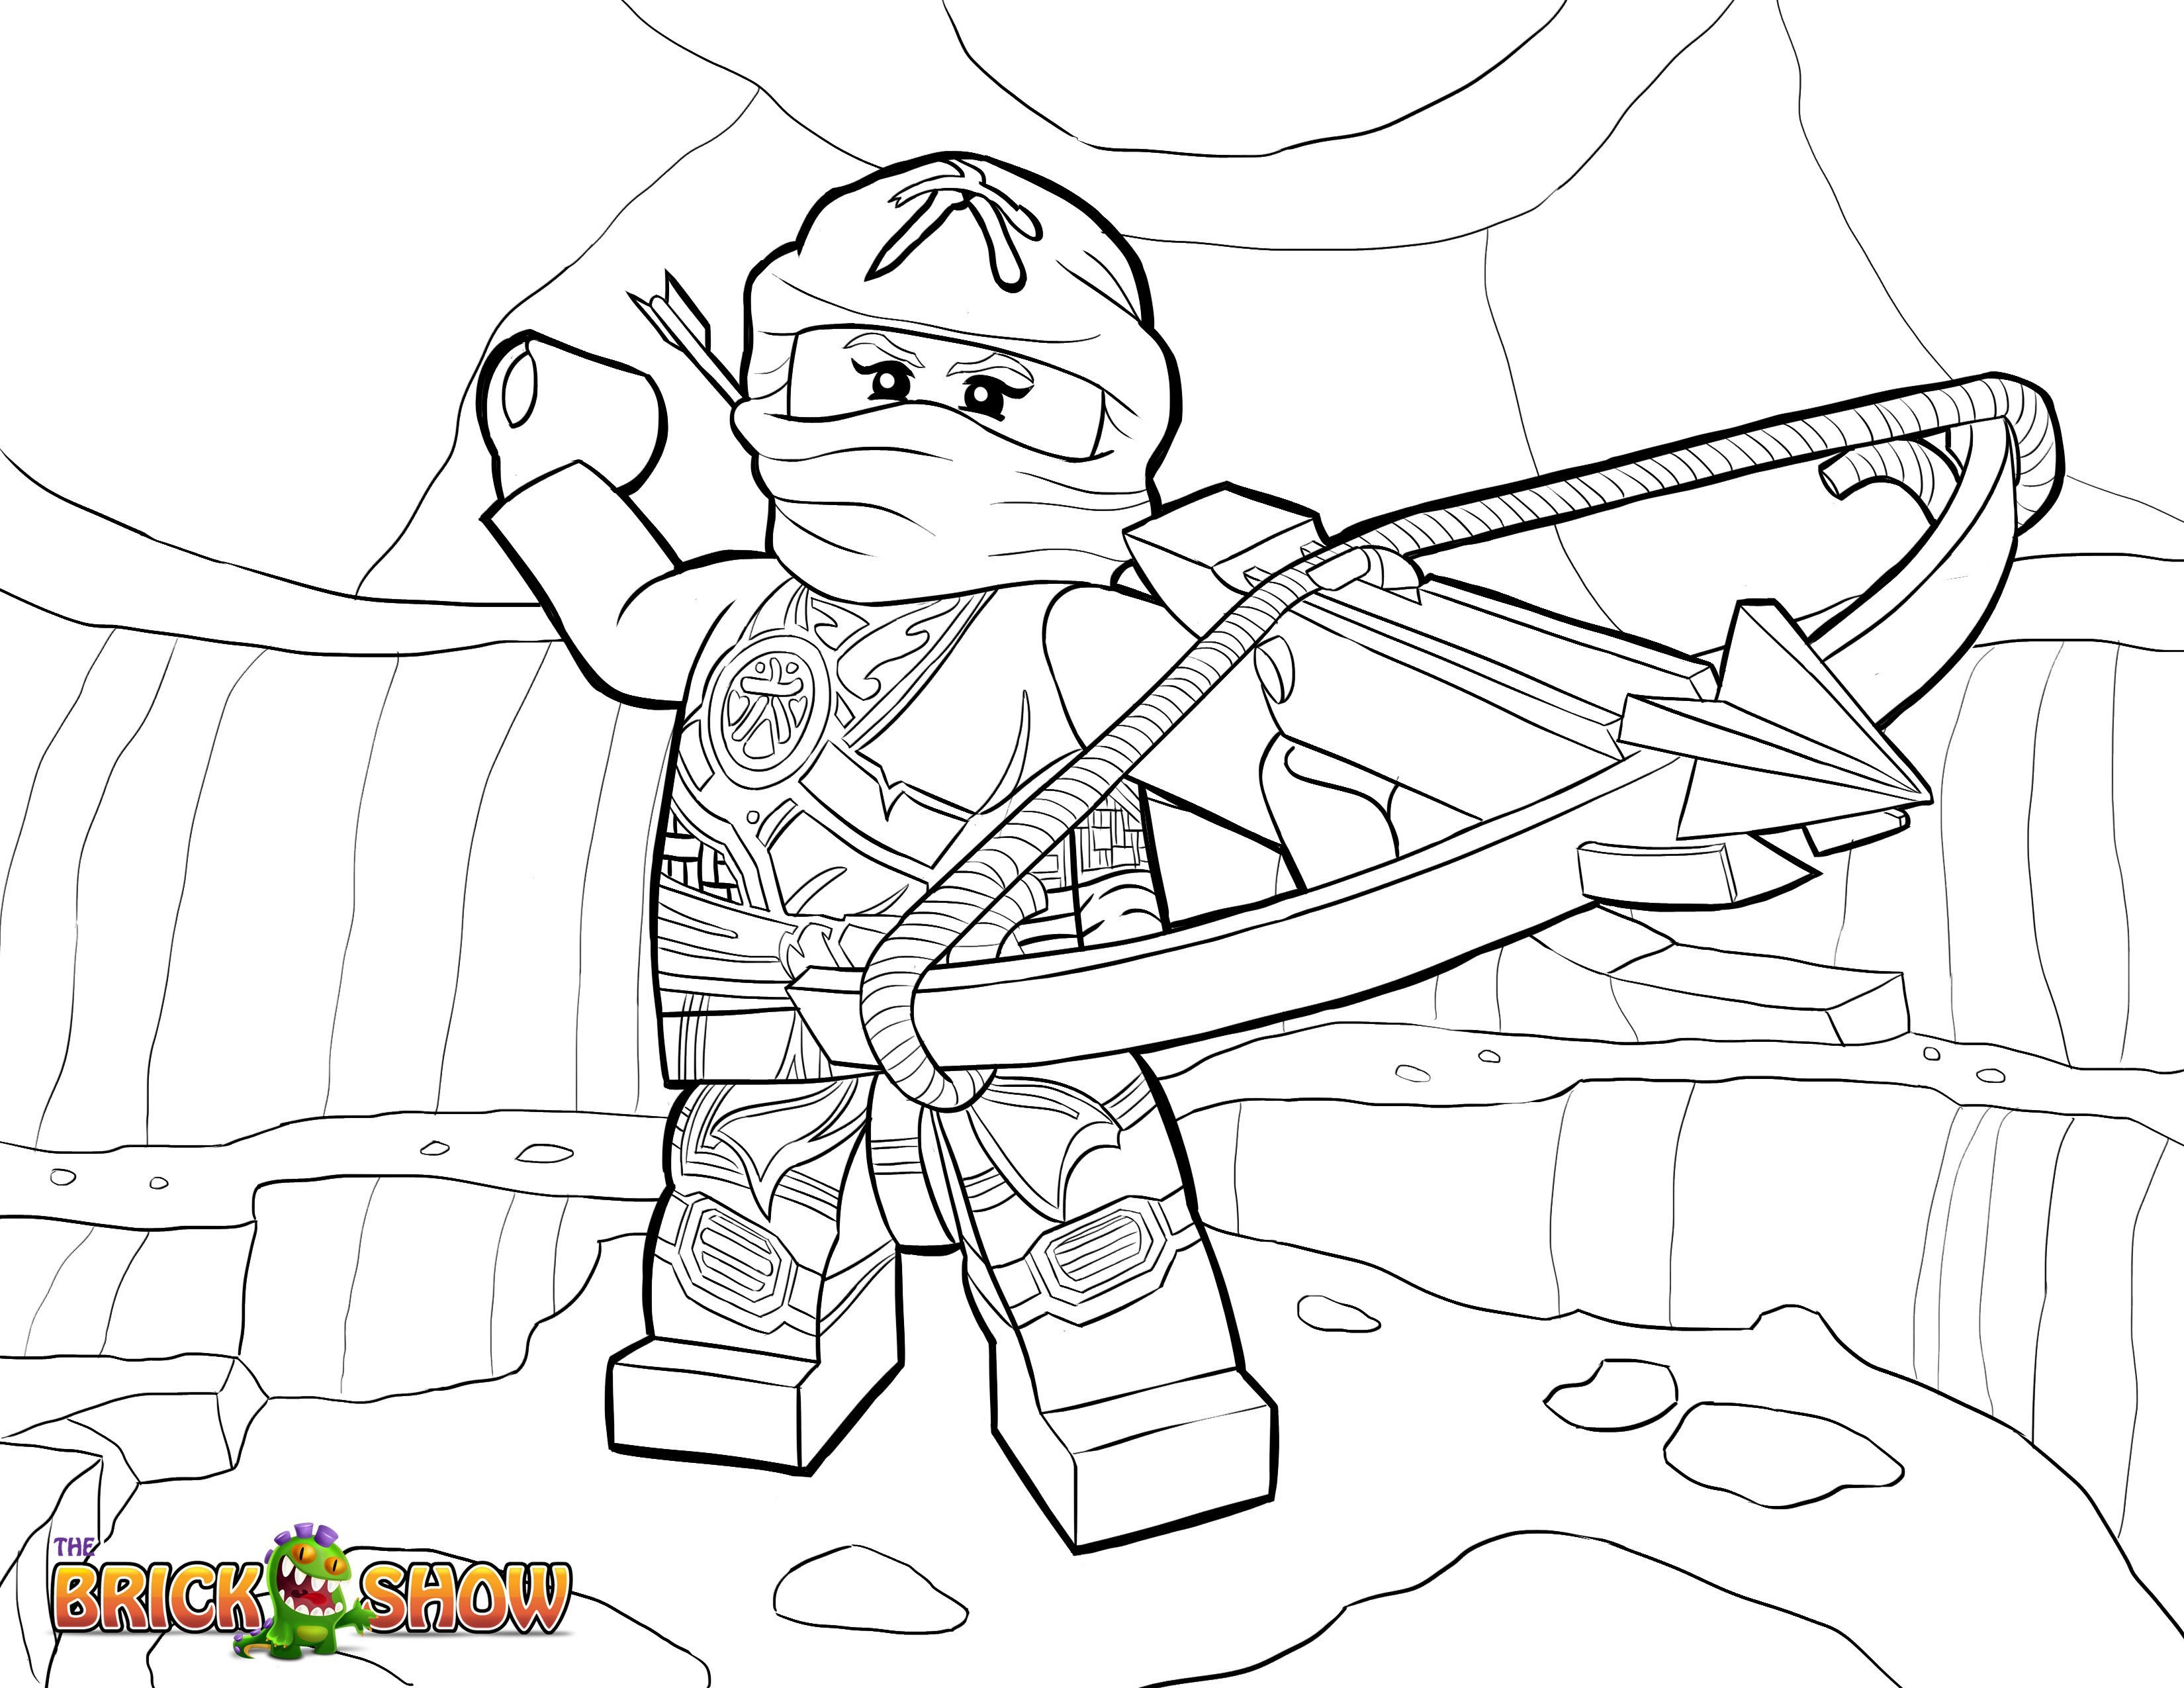 Ninjago Jay Ausmalbild Genial Lego Ninjago Coloring Pages Free Coloring Pages Inspirierend Ninjago Fotos